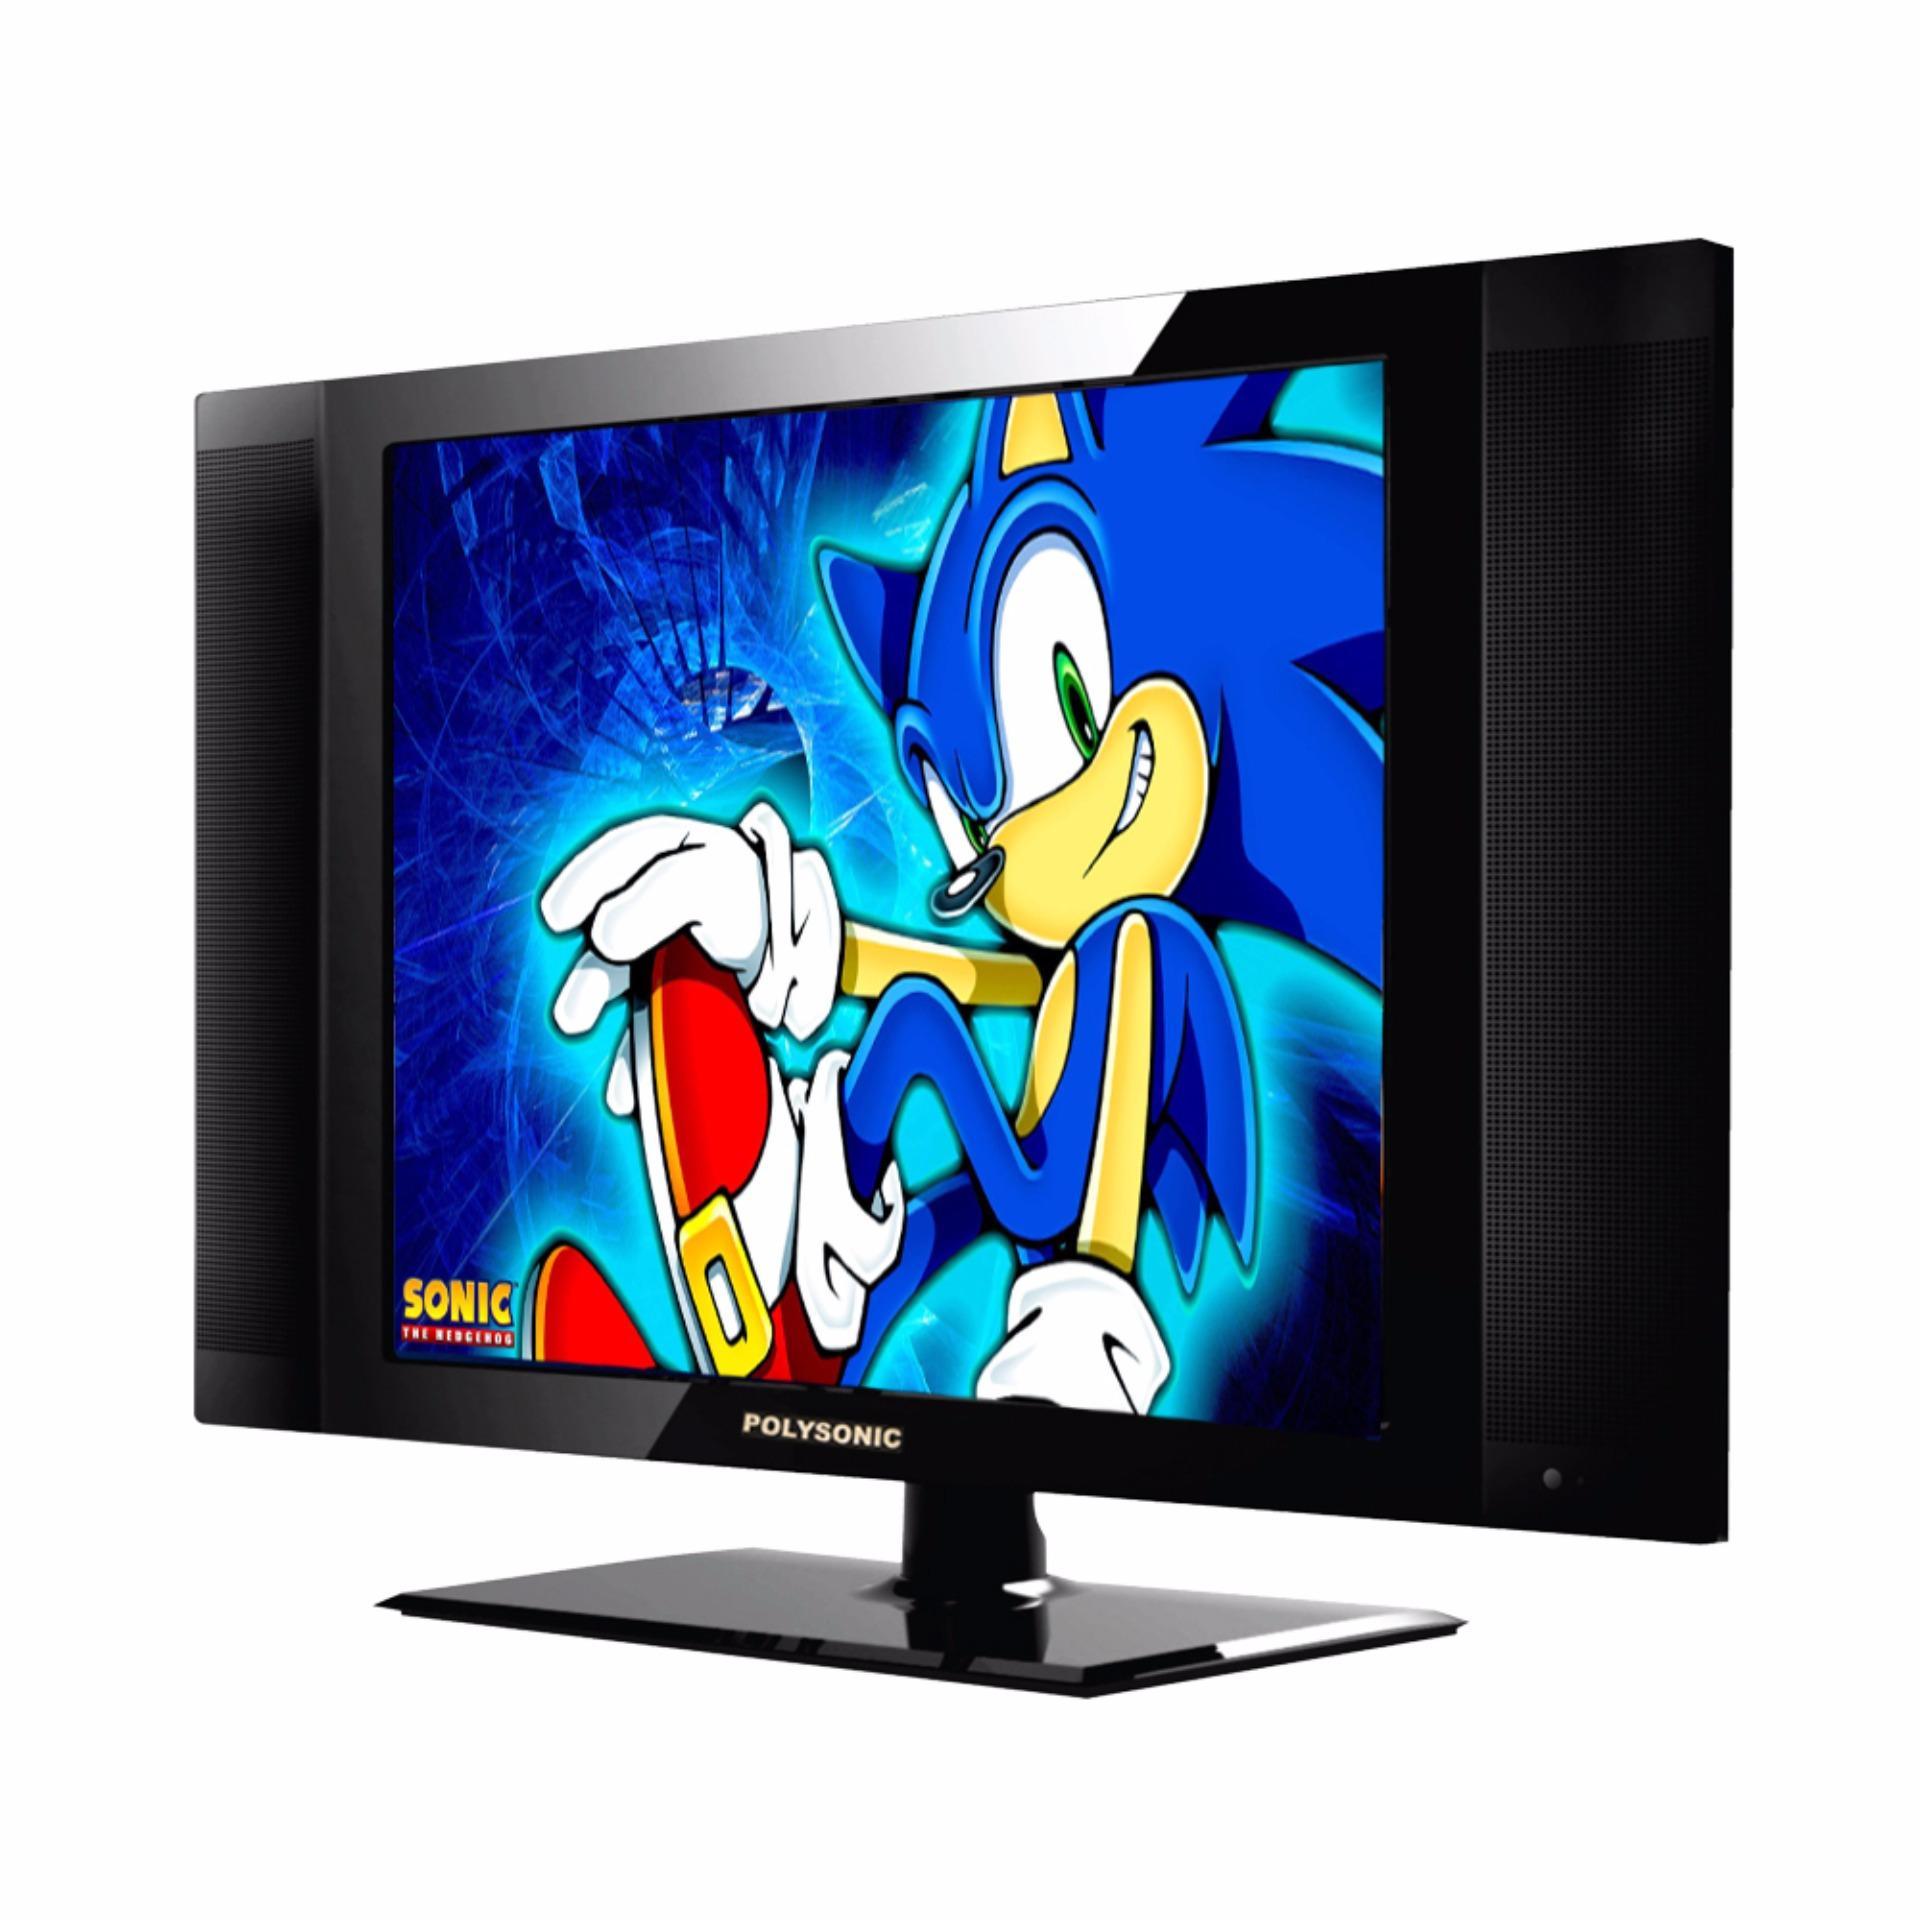 LED TV 19 inch Polysonic PS1892i - Hitam